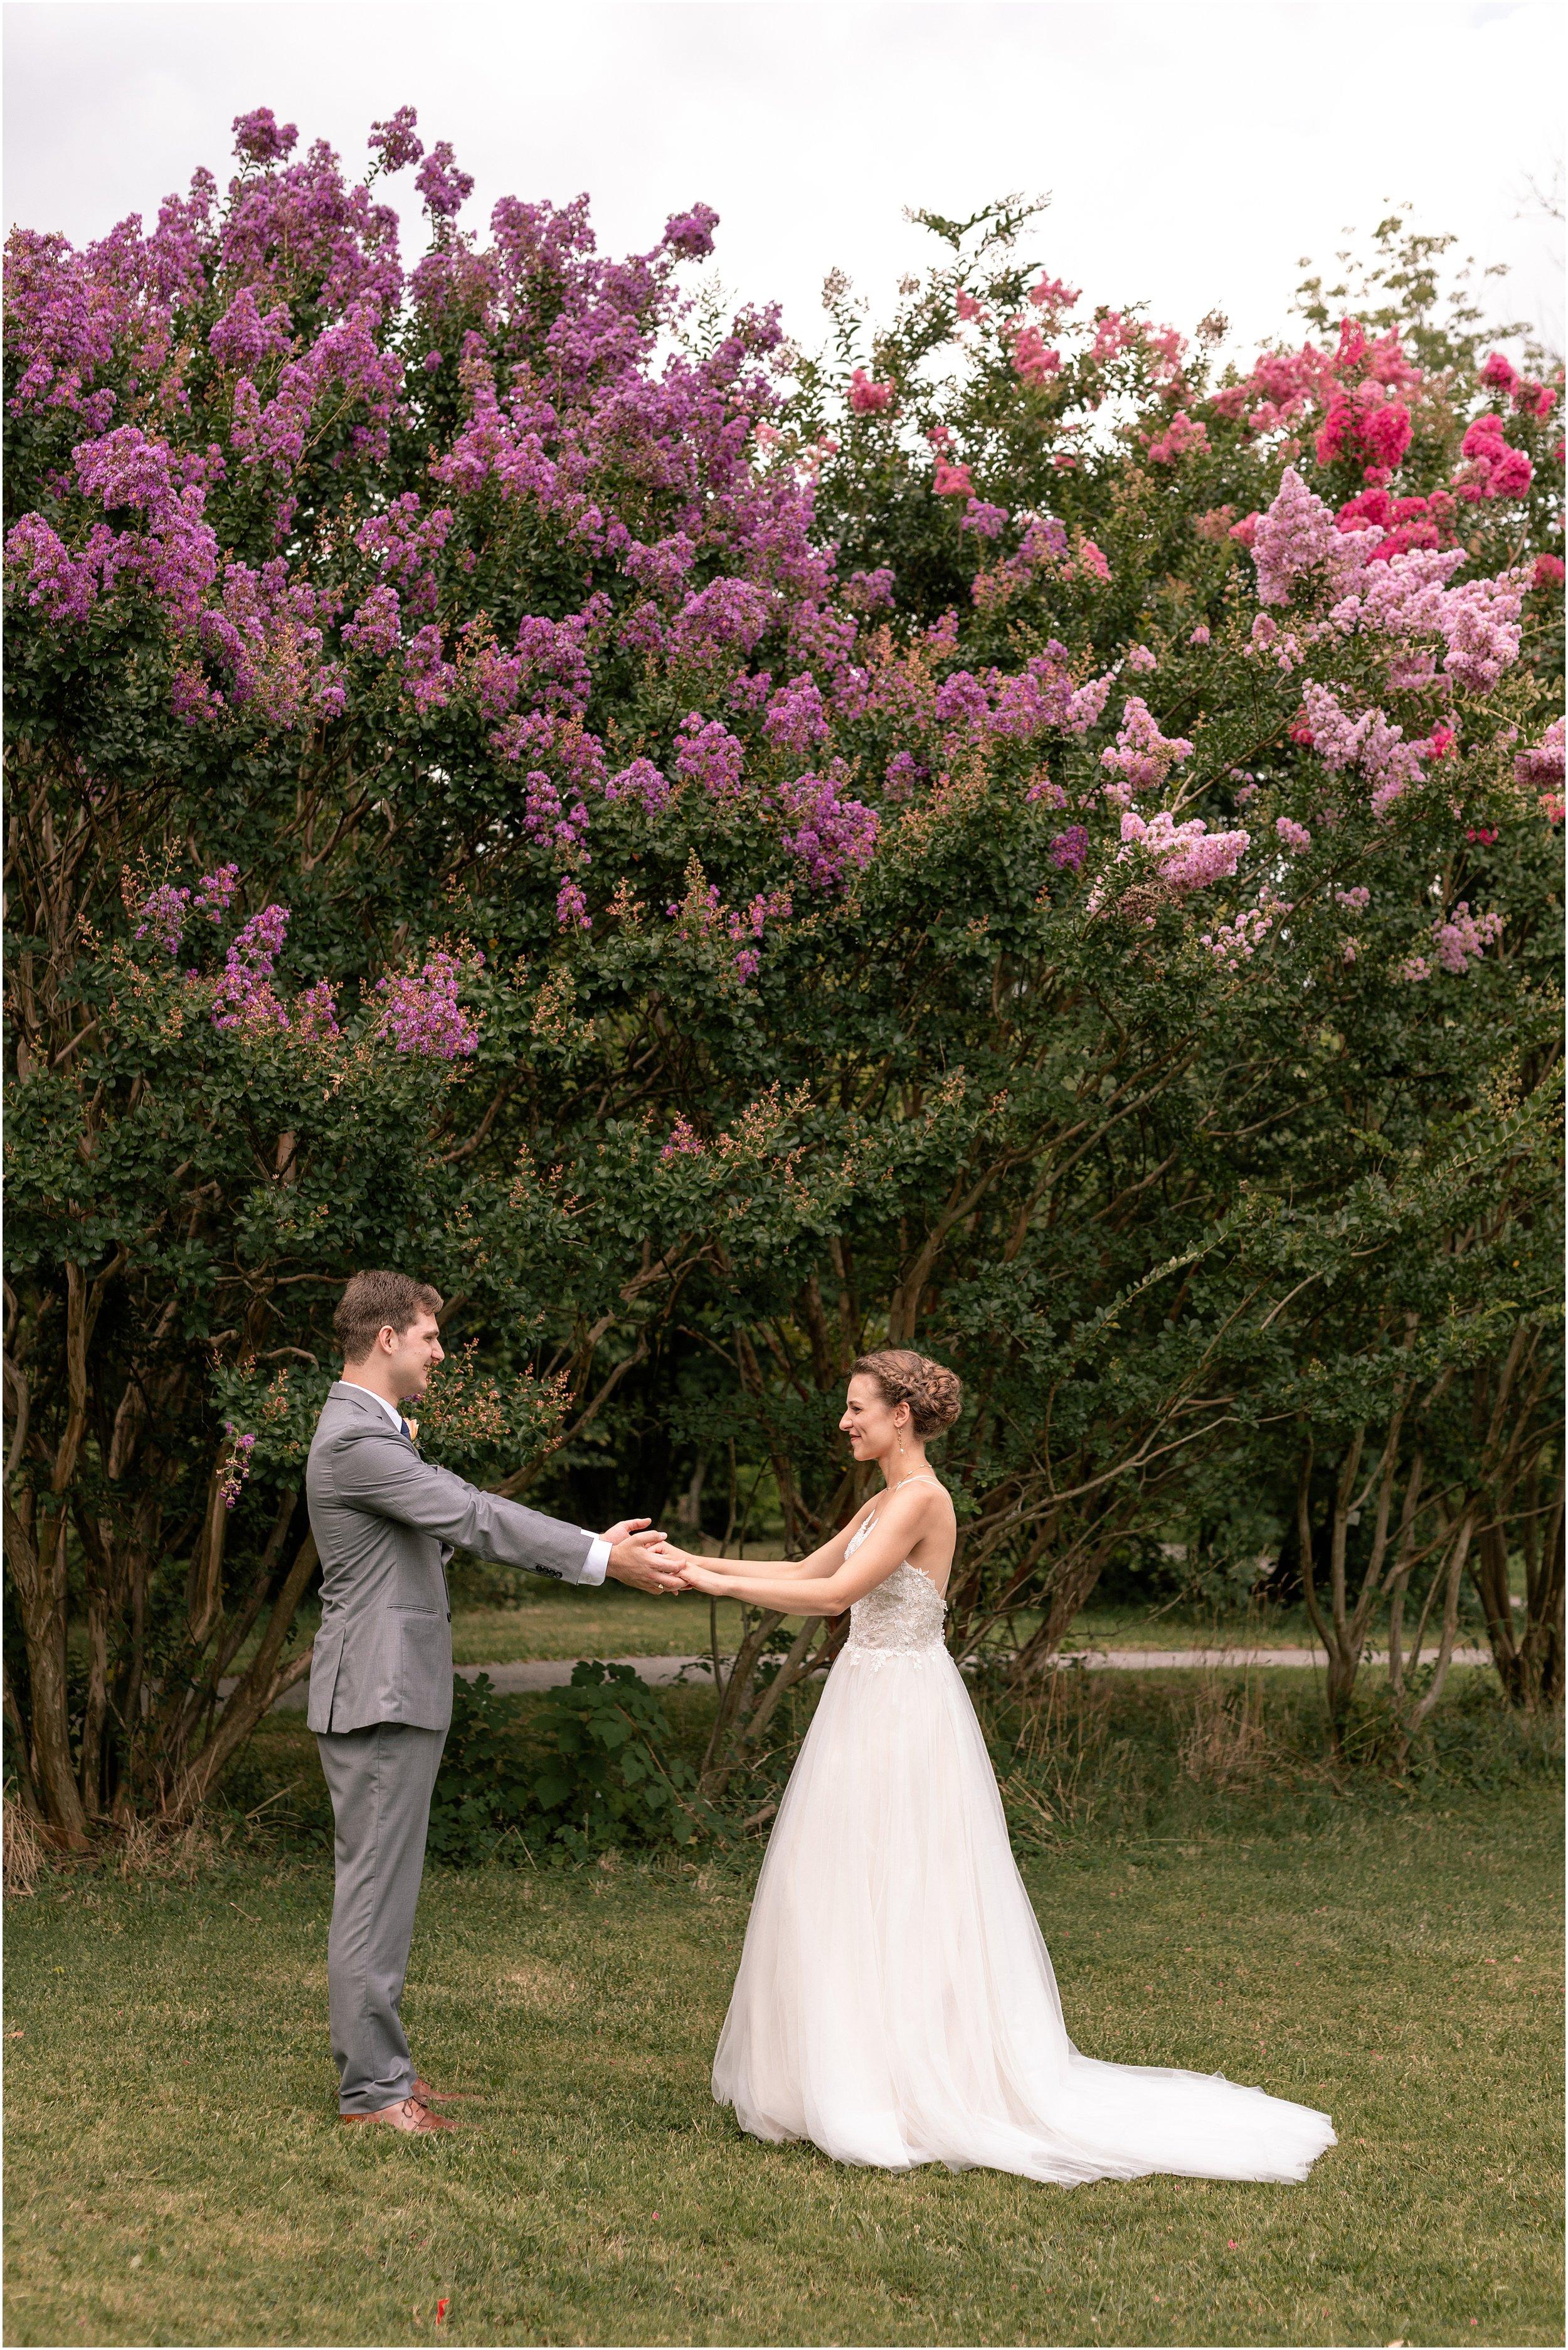 hannah leigh photography Cylburn Arboretum Wedding Baltimore, MD_3413.jpg